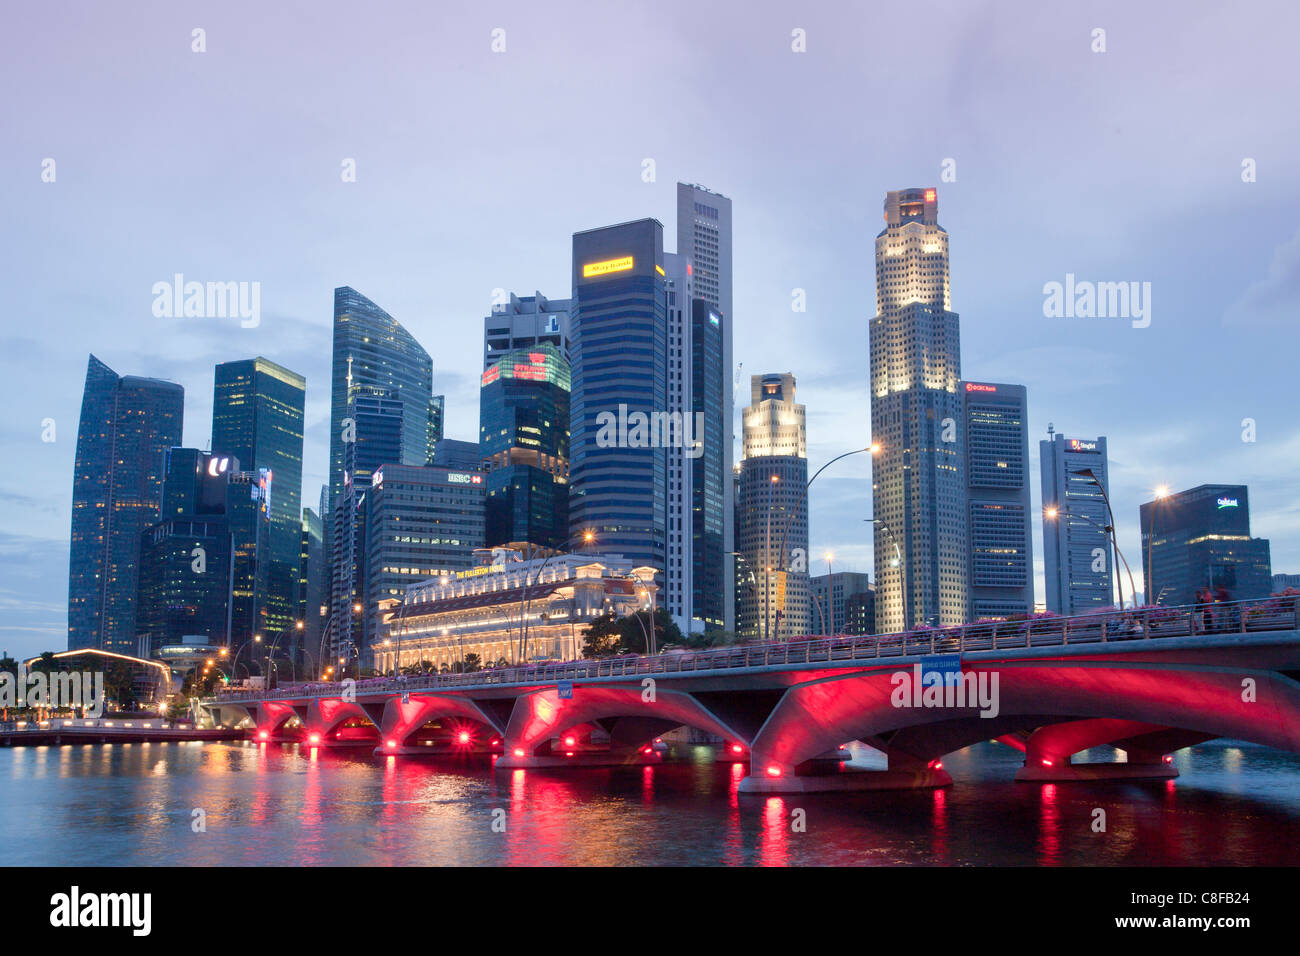 Singapore, Asia, Downtown, bridge, lights, illumination, red, skyscraper, blocks of flats, high-rise buildings, - Stock Image